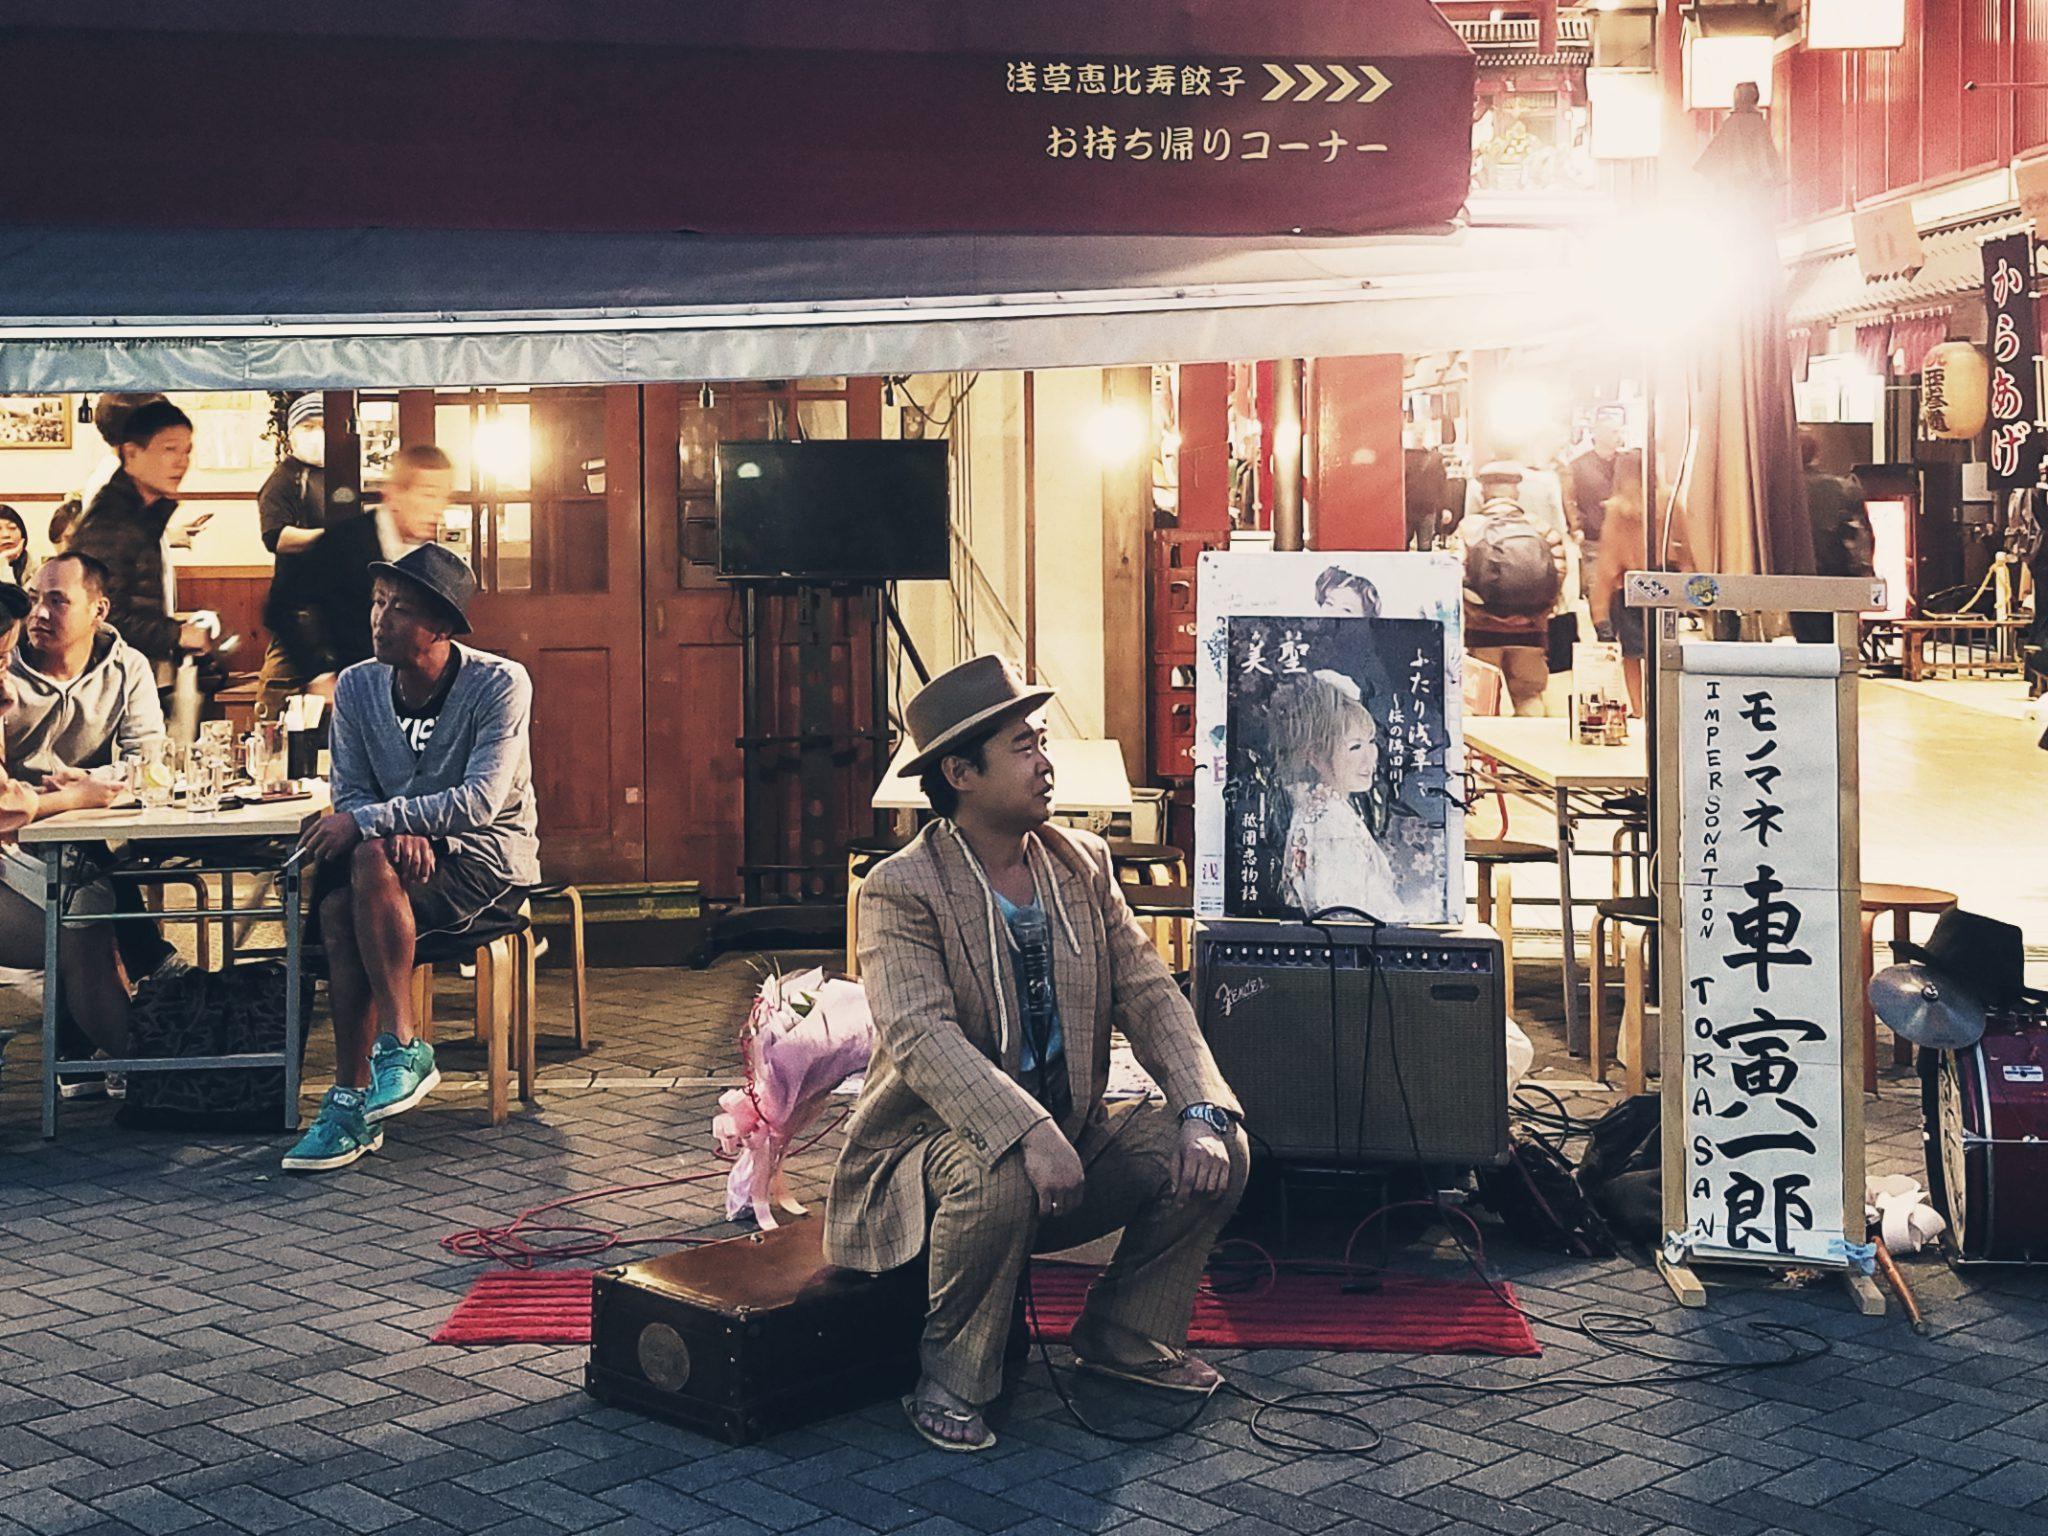 Otoko wa tsuraiyo: It's tough being a man with Tora-san impersonator at Tokyo ChaChaCha